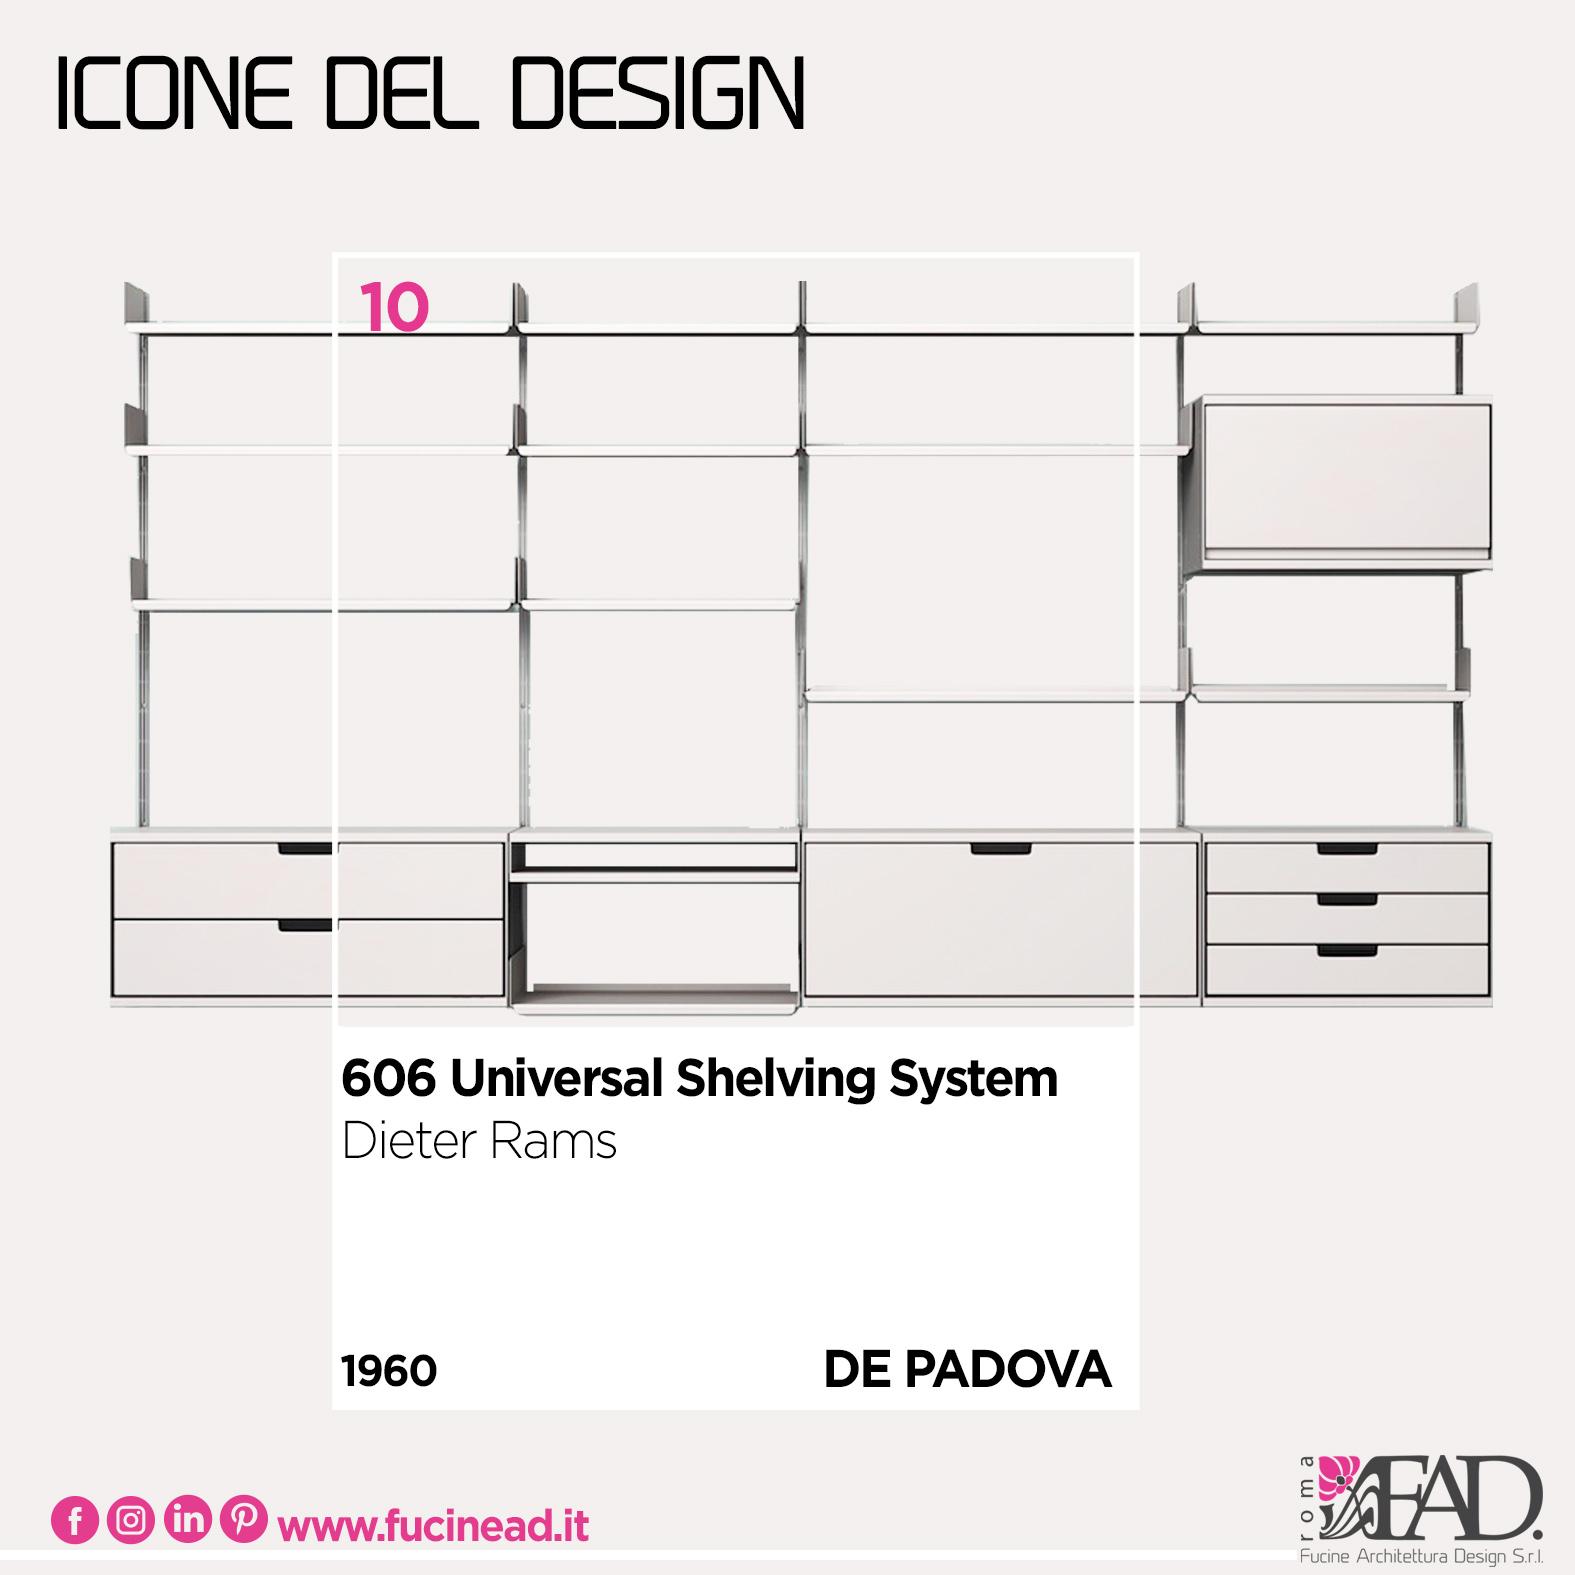 606 Universal Shelving System – 1960 Dieter Rams by De Padova